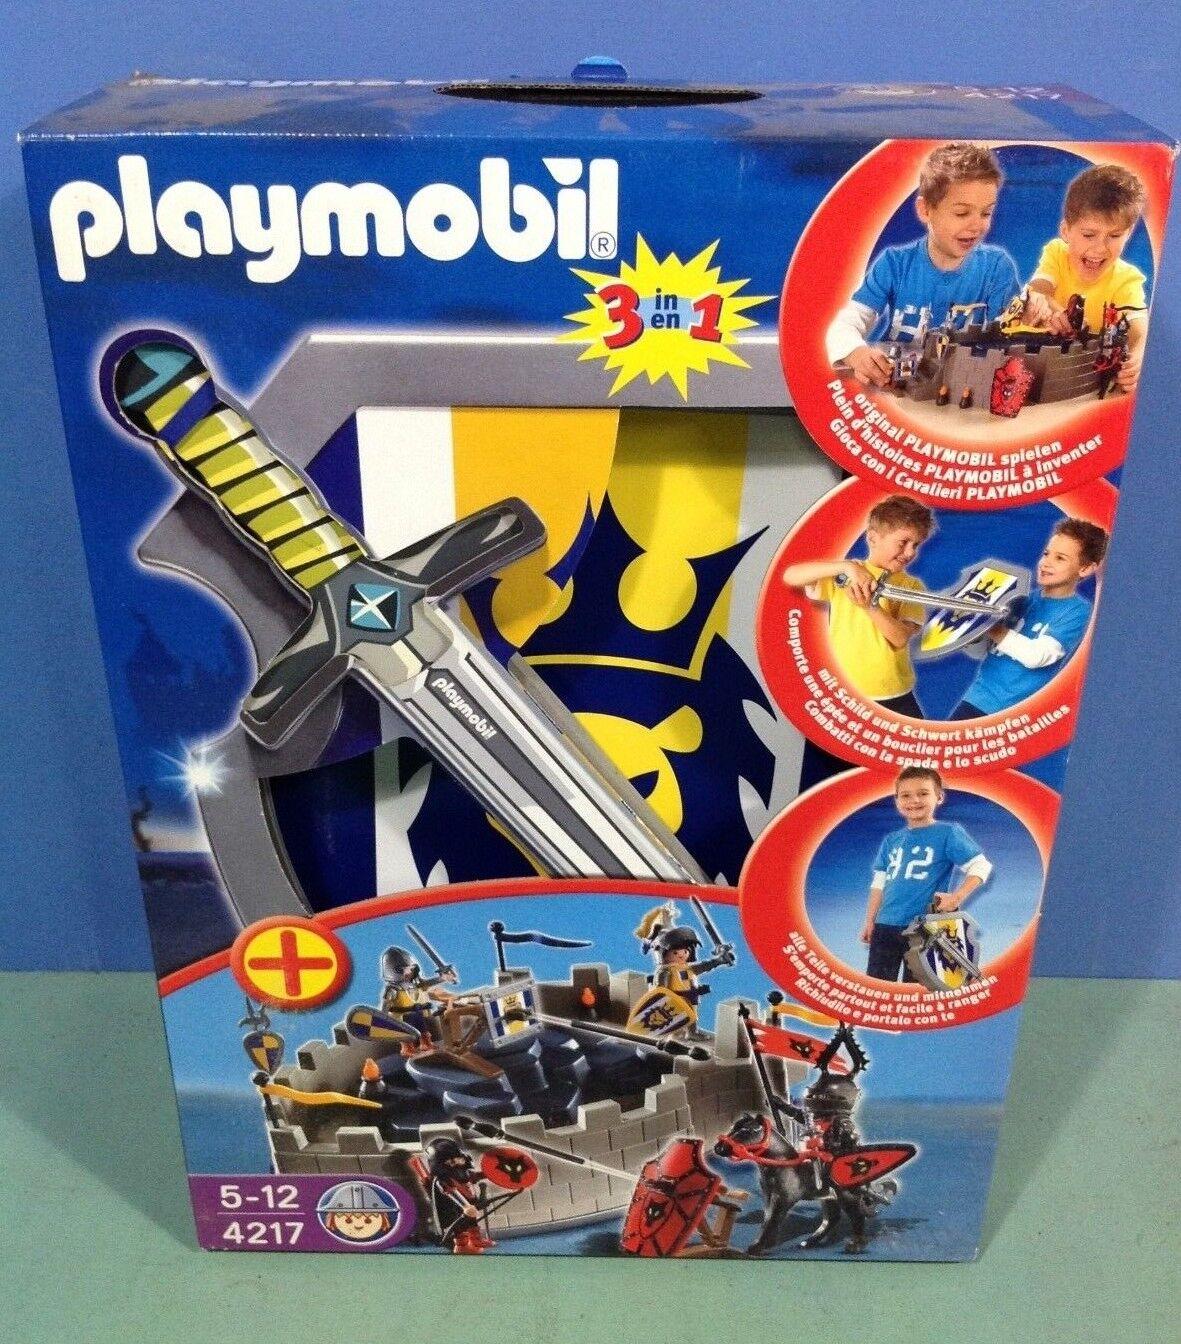 (P4217) playmobil playmobil playmobil Set chevalier transportable ref 4217 en boite neuve année 2008 a2a6ce